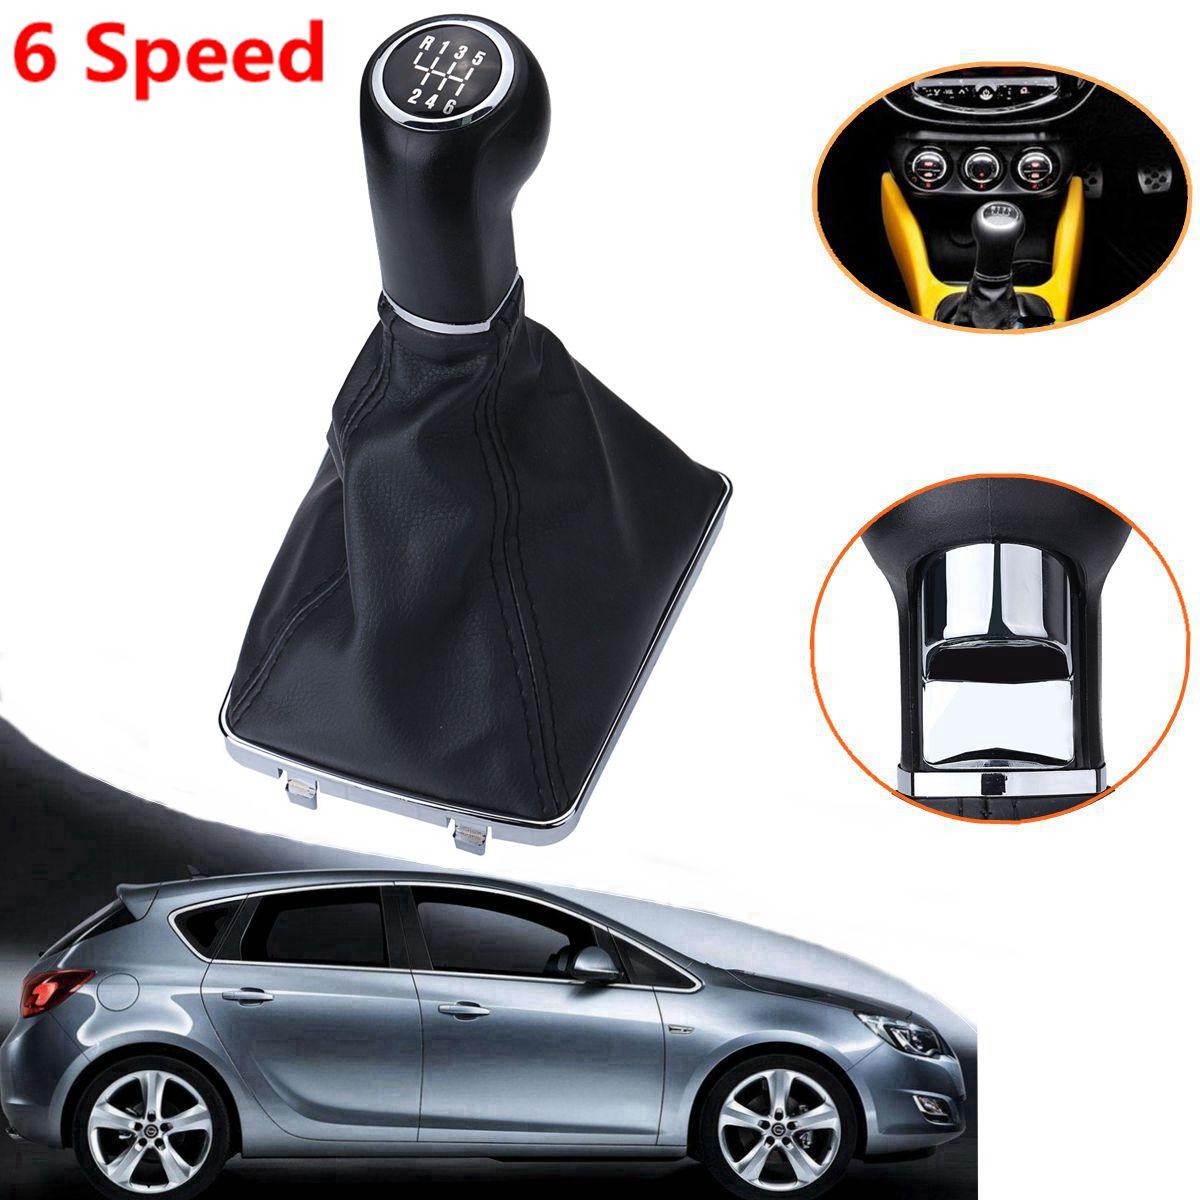 5/6 Speed Car Gear Shift Knob Lever Stick Gaiter Boot For Opel Astra Corsa GTC 2005 2006 2007 2008 2009 2010 5 speed car black gear knob chrome cap top for vauxhall opel astra iii h corsa d 04 10